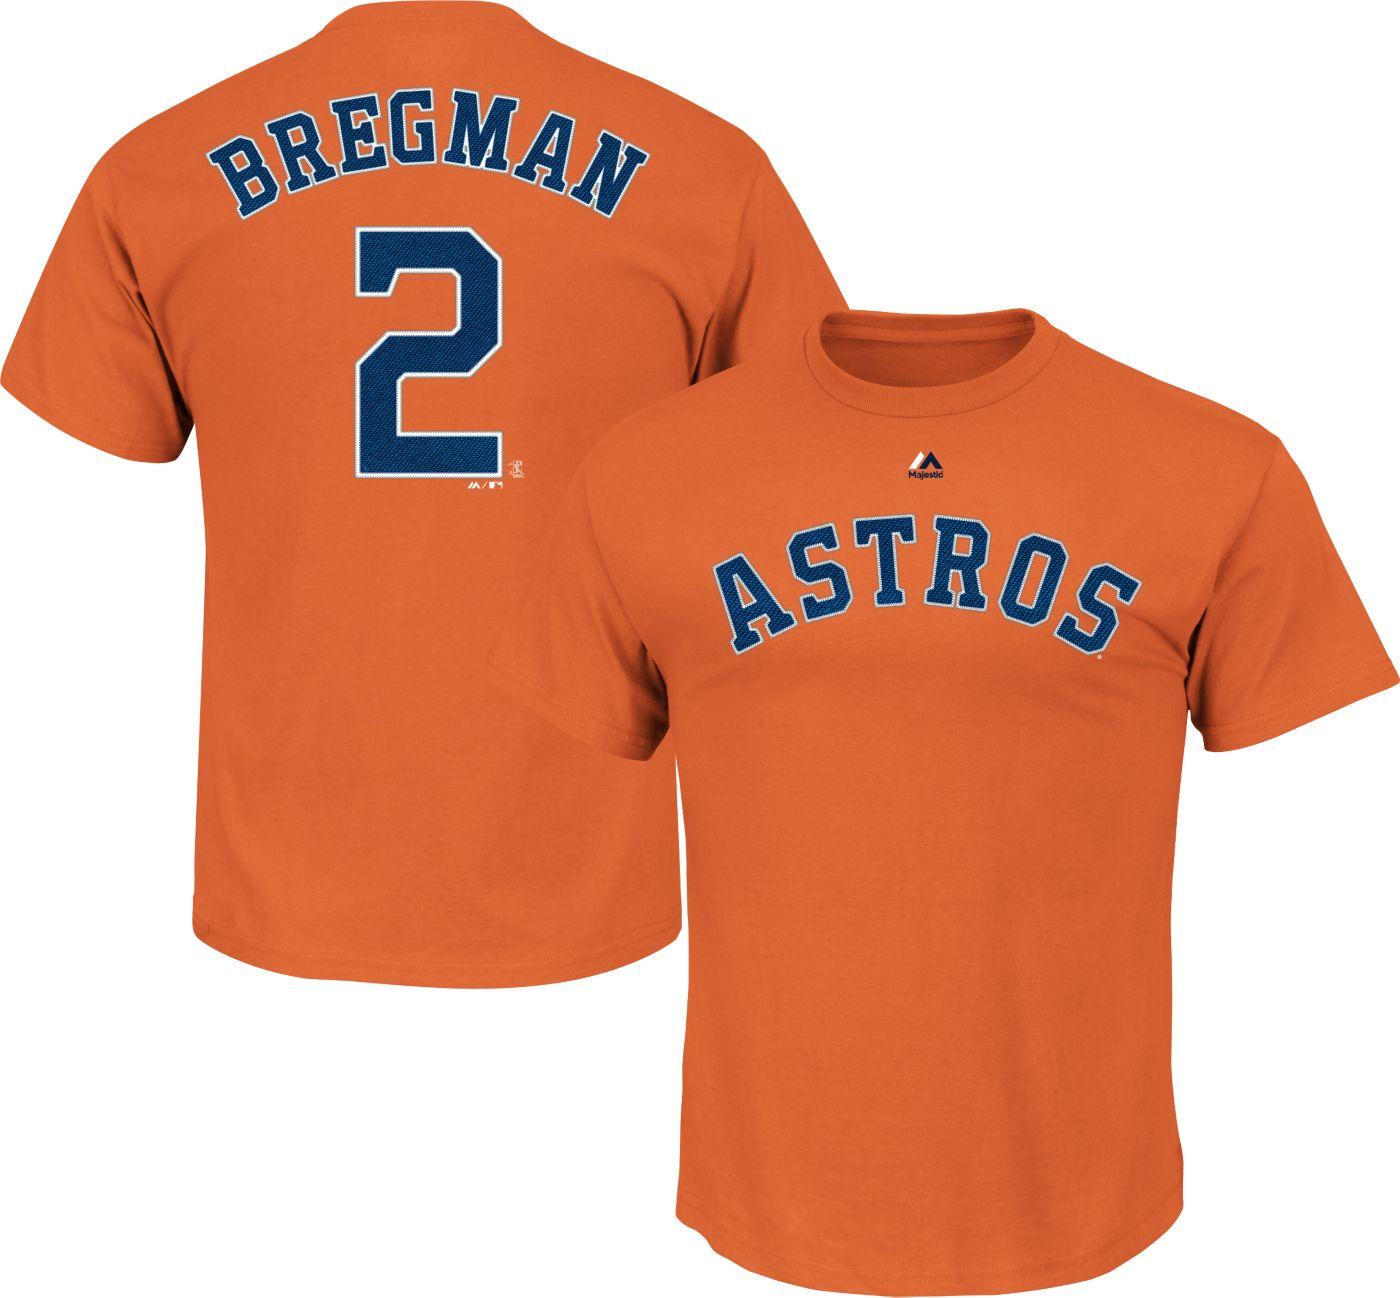 Majestic Youth Houston Astros Alex Bregman #2 Orange T-Shirt